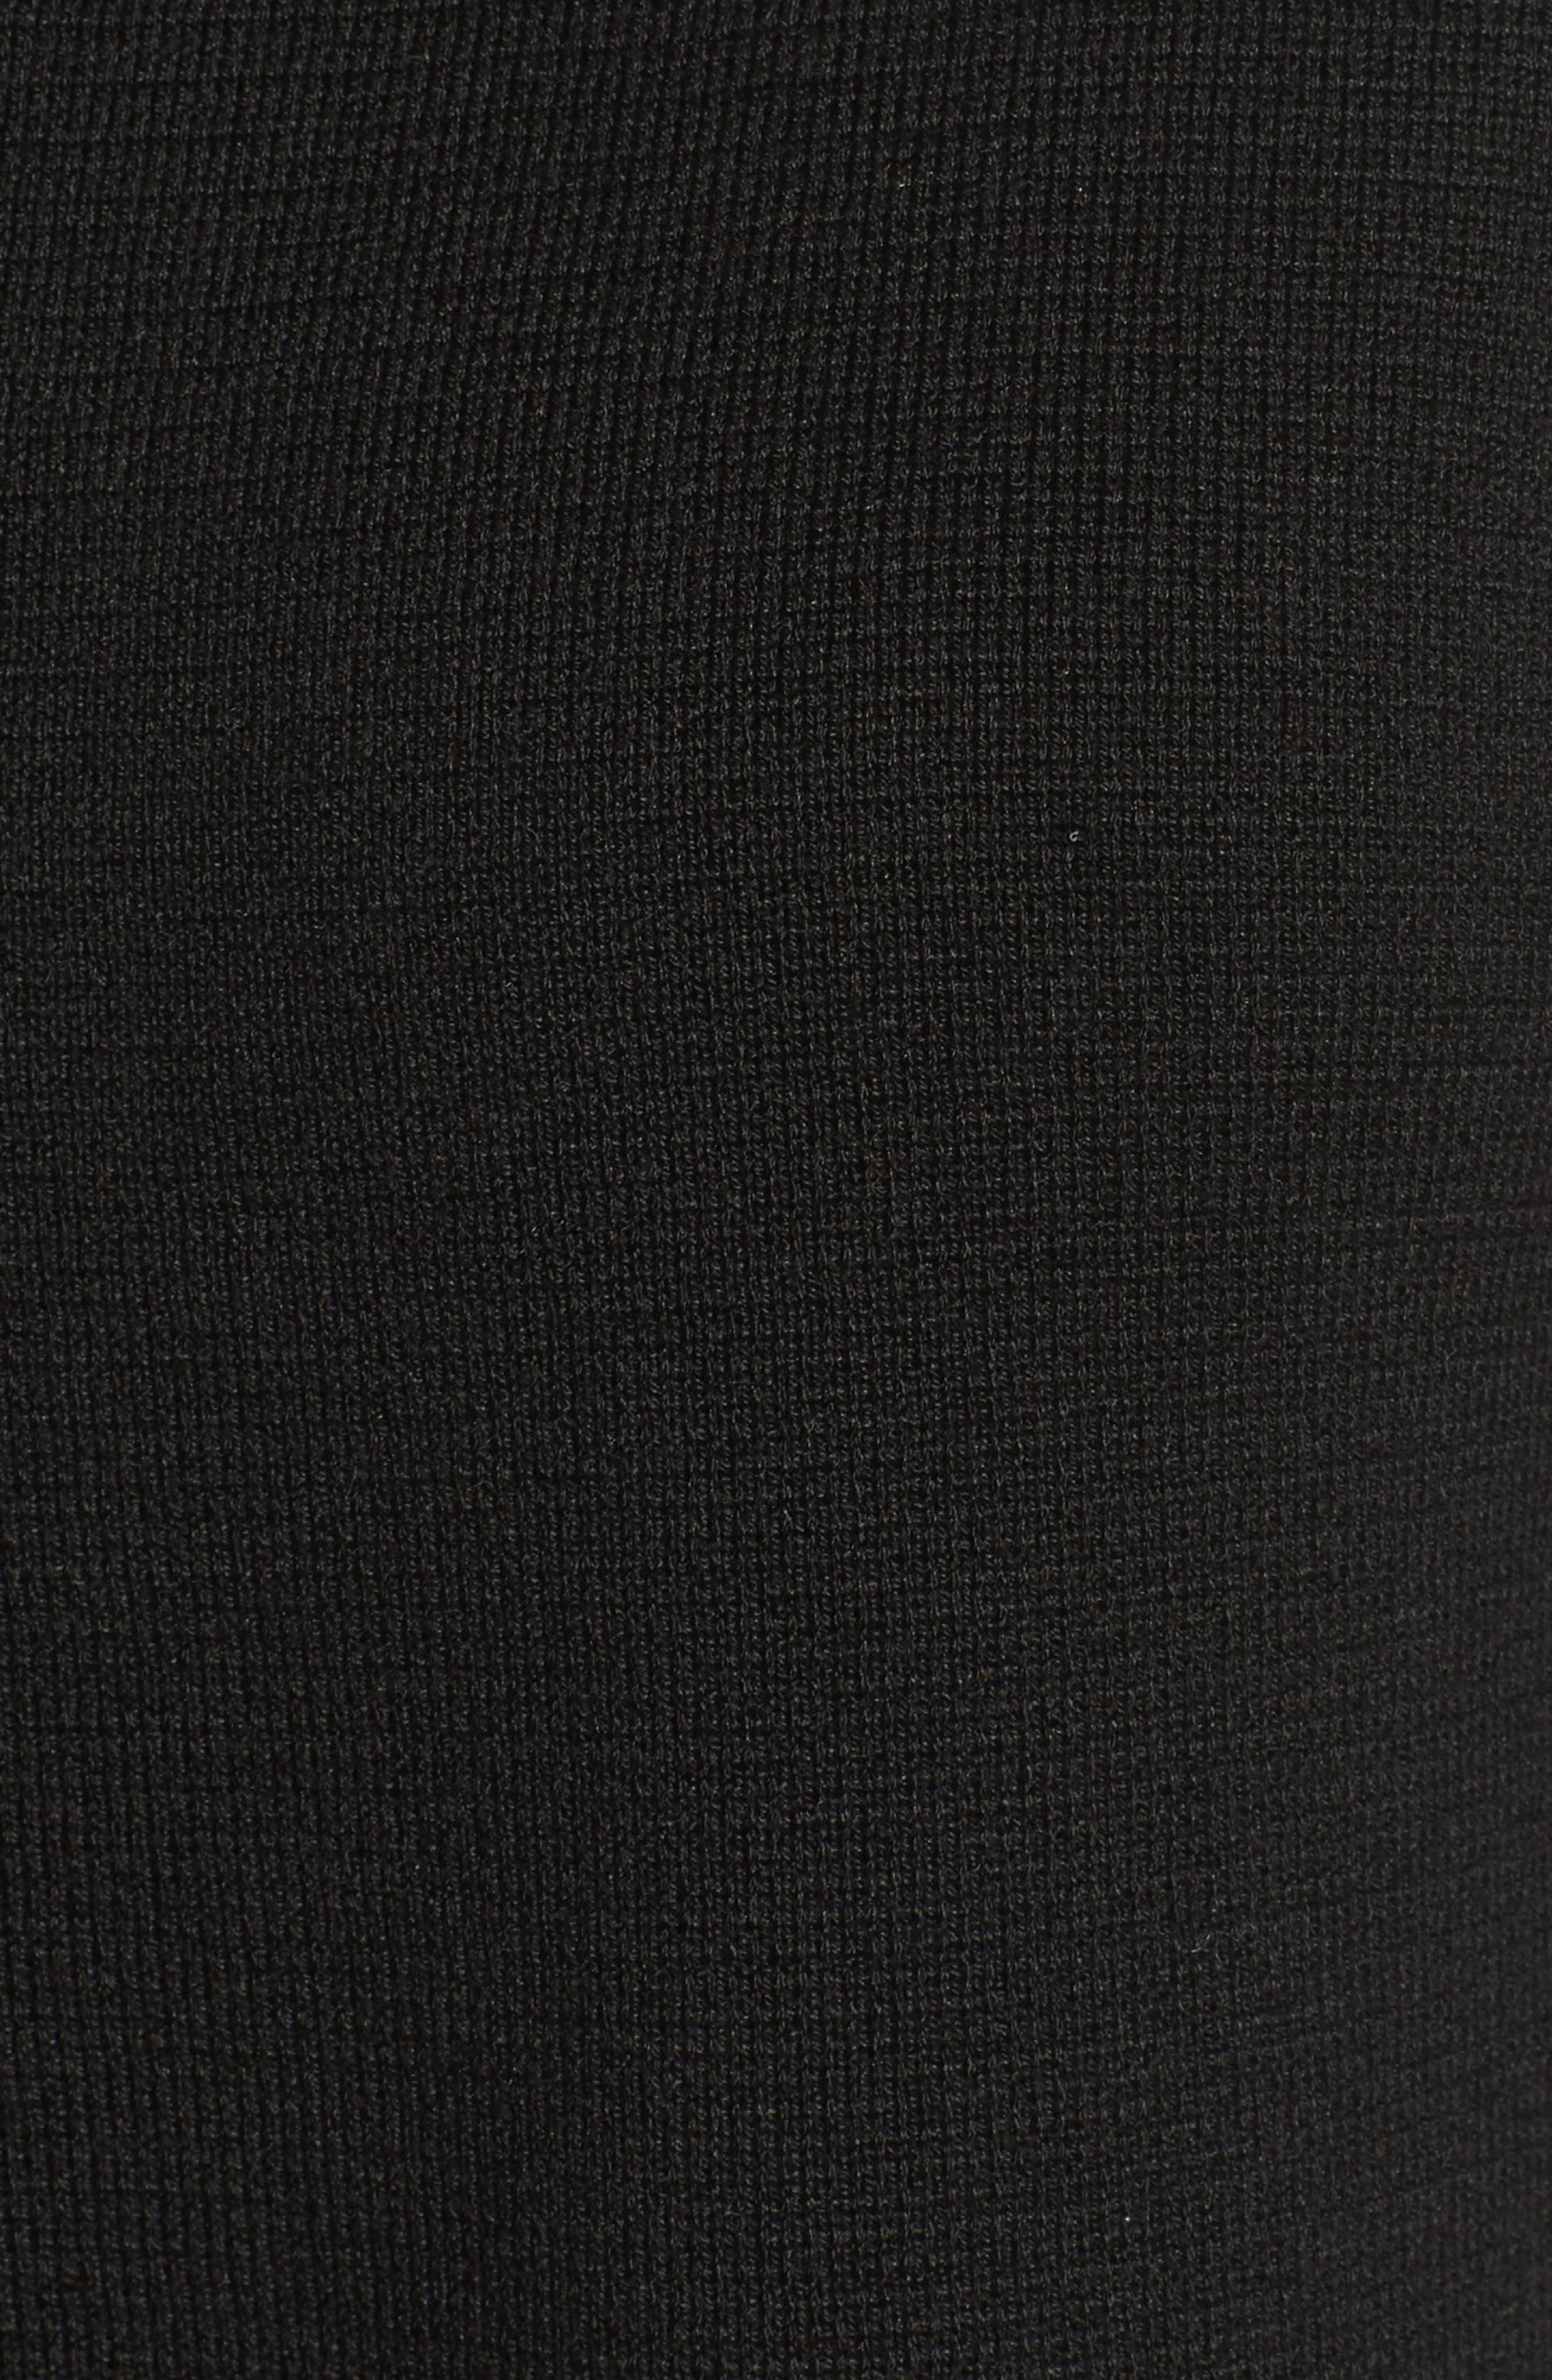 Silk & Organic Cotton Interlock Knit Funnel Neck Jacket,                             Alternate thumbnail 6, color,                             001